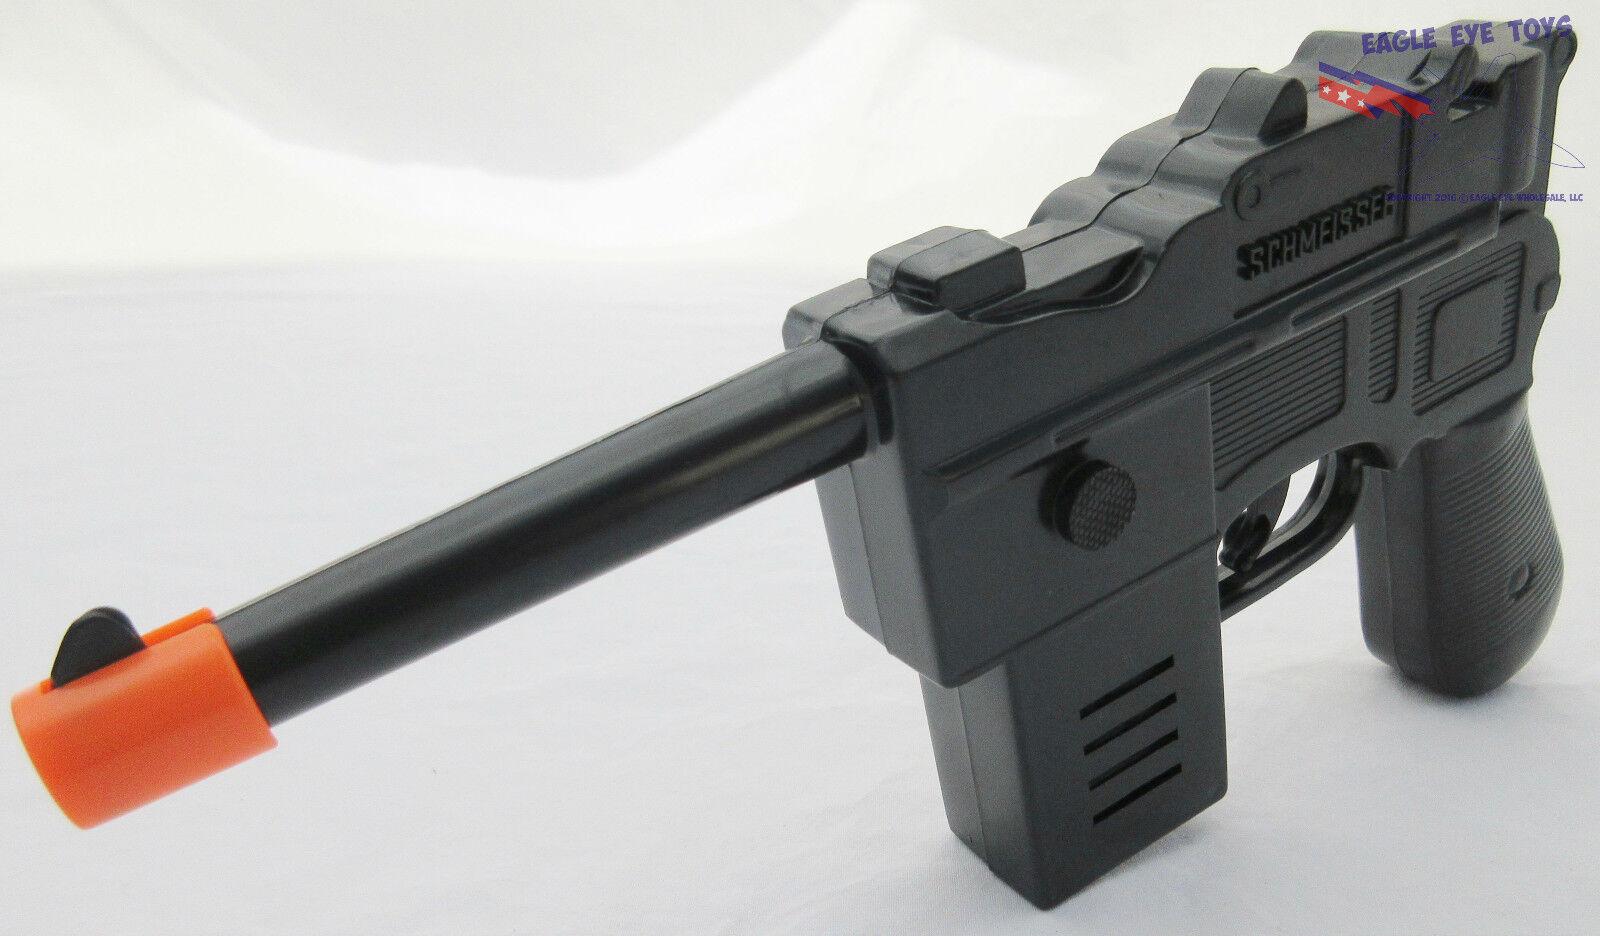 3x Toy Guns M1 Carbine Toy Rifle w Bayonet 'Broom Handle'